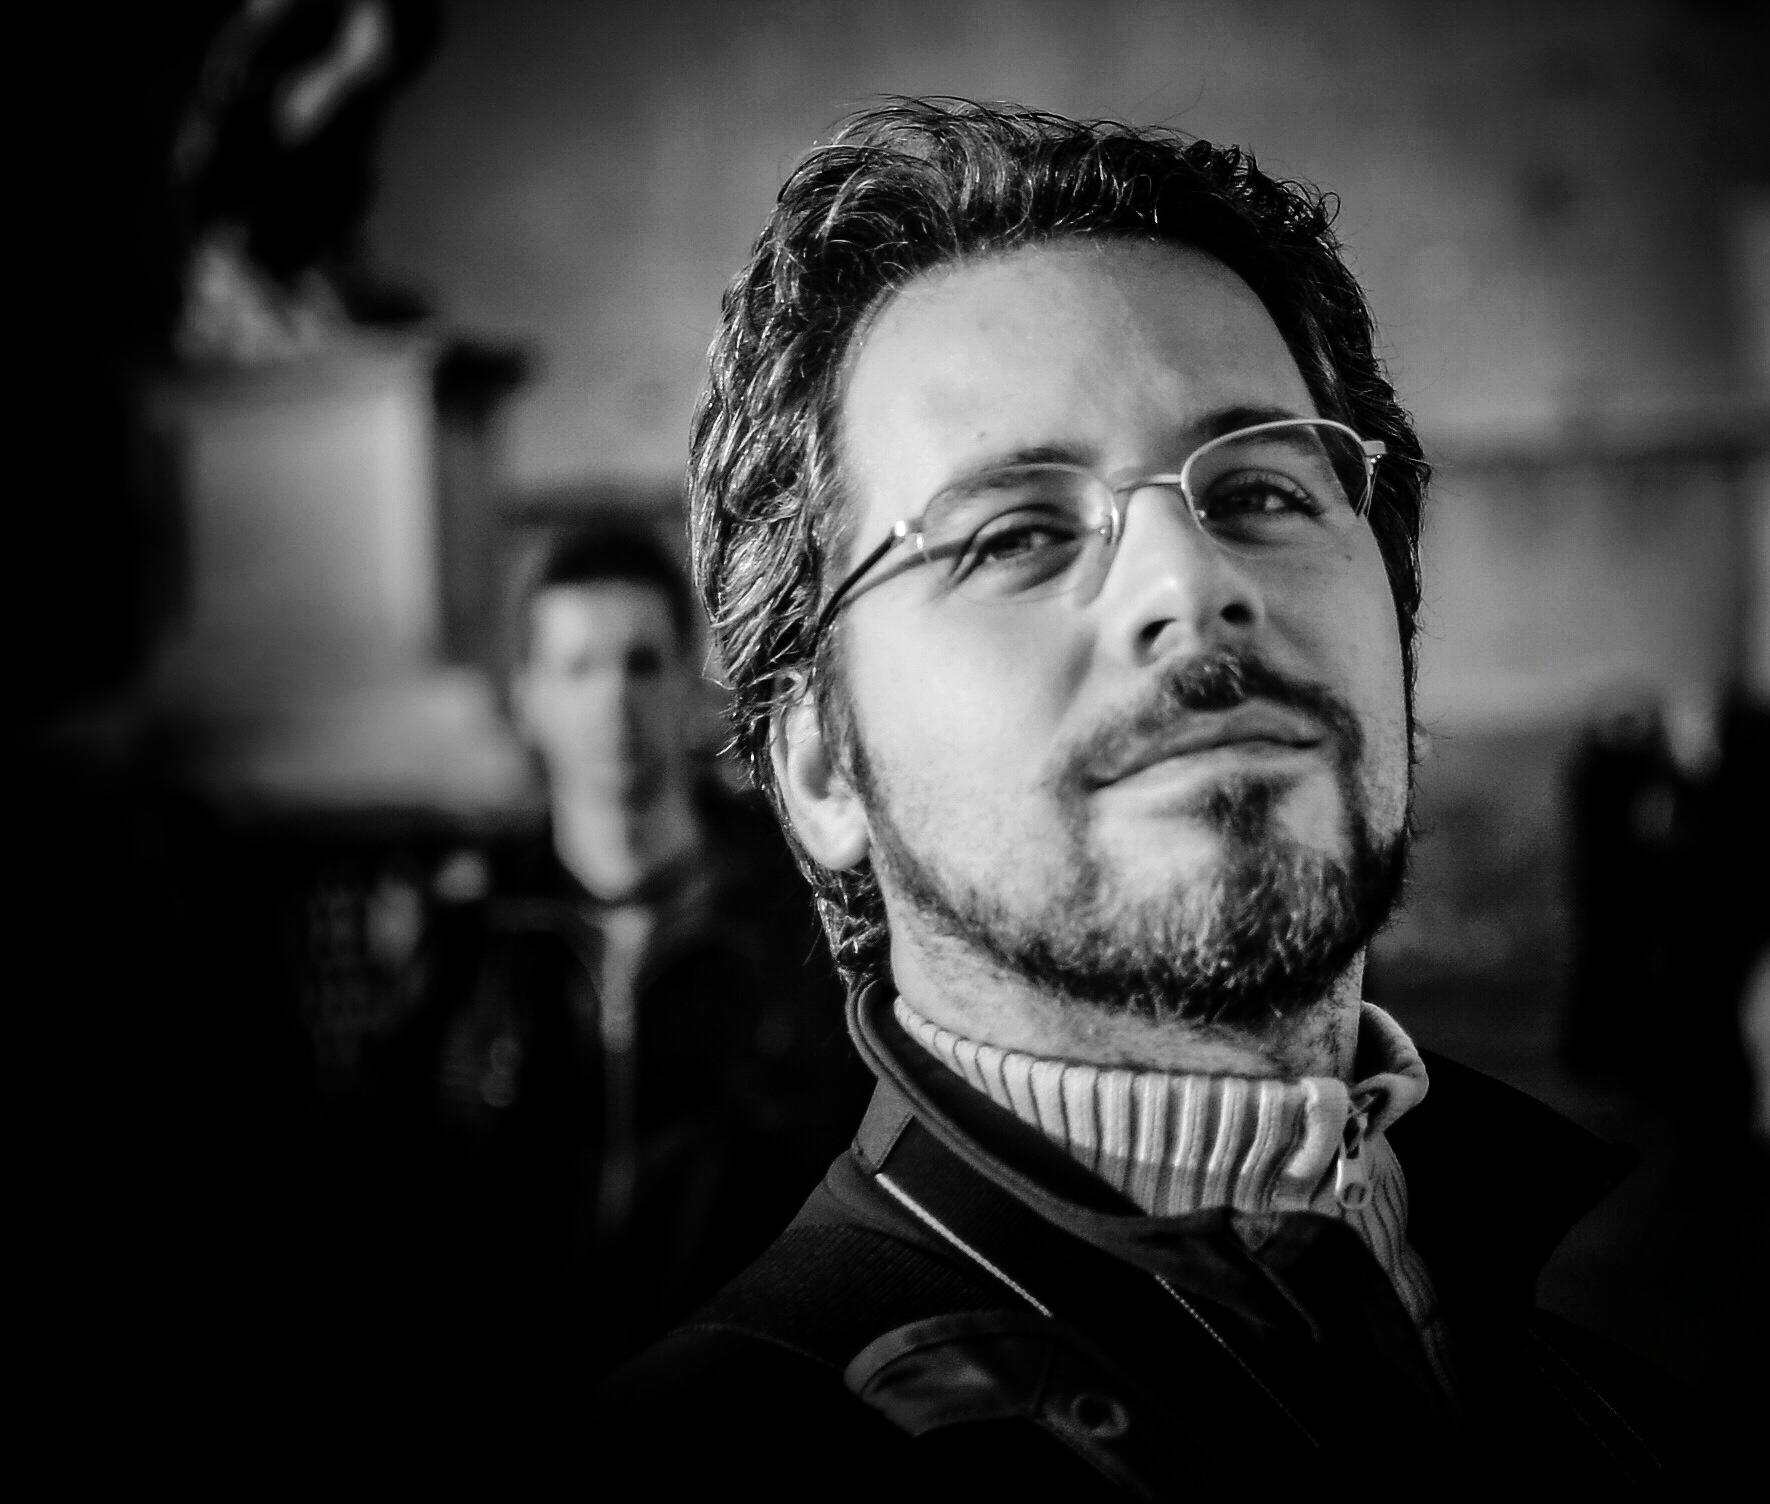 Marco Lamberto @polylm